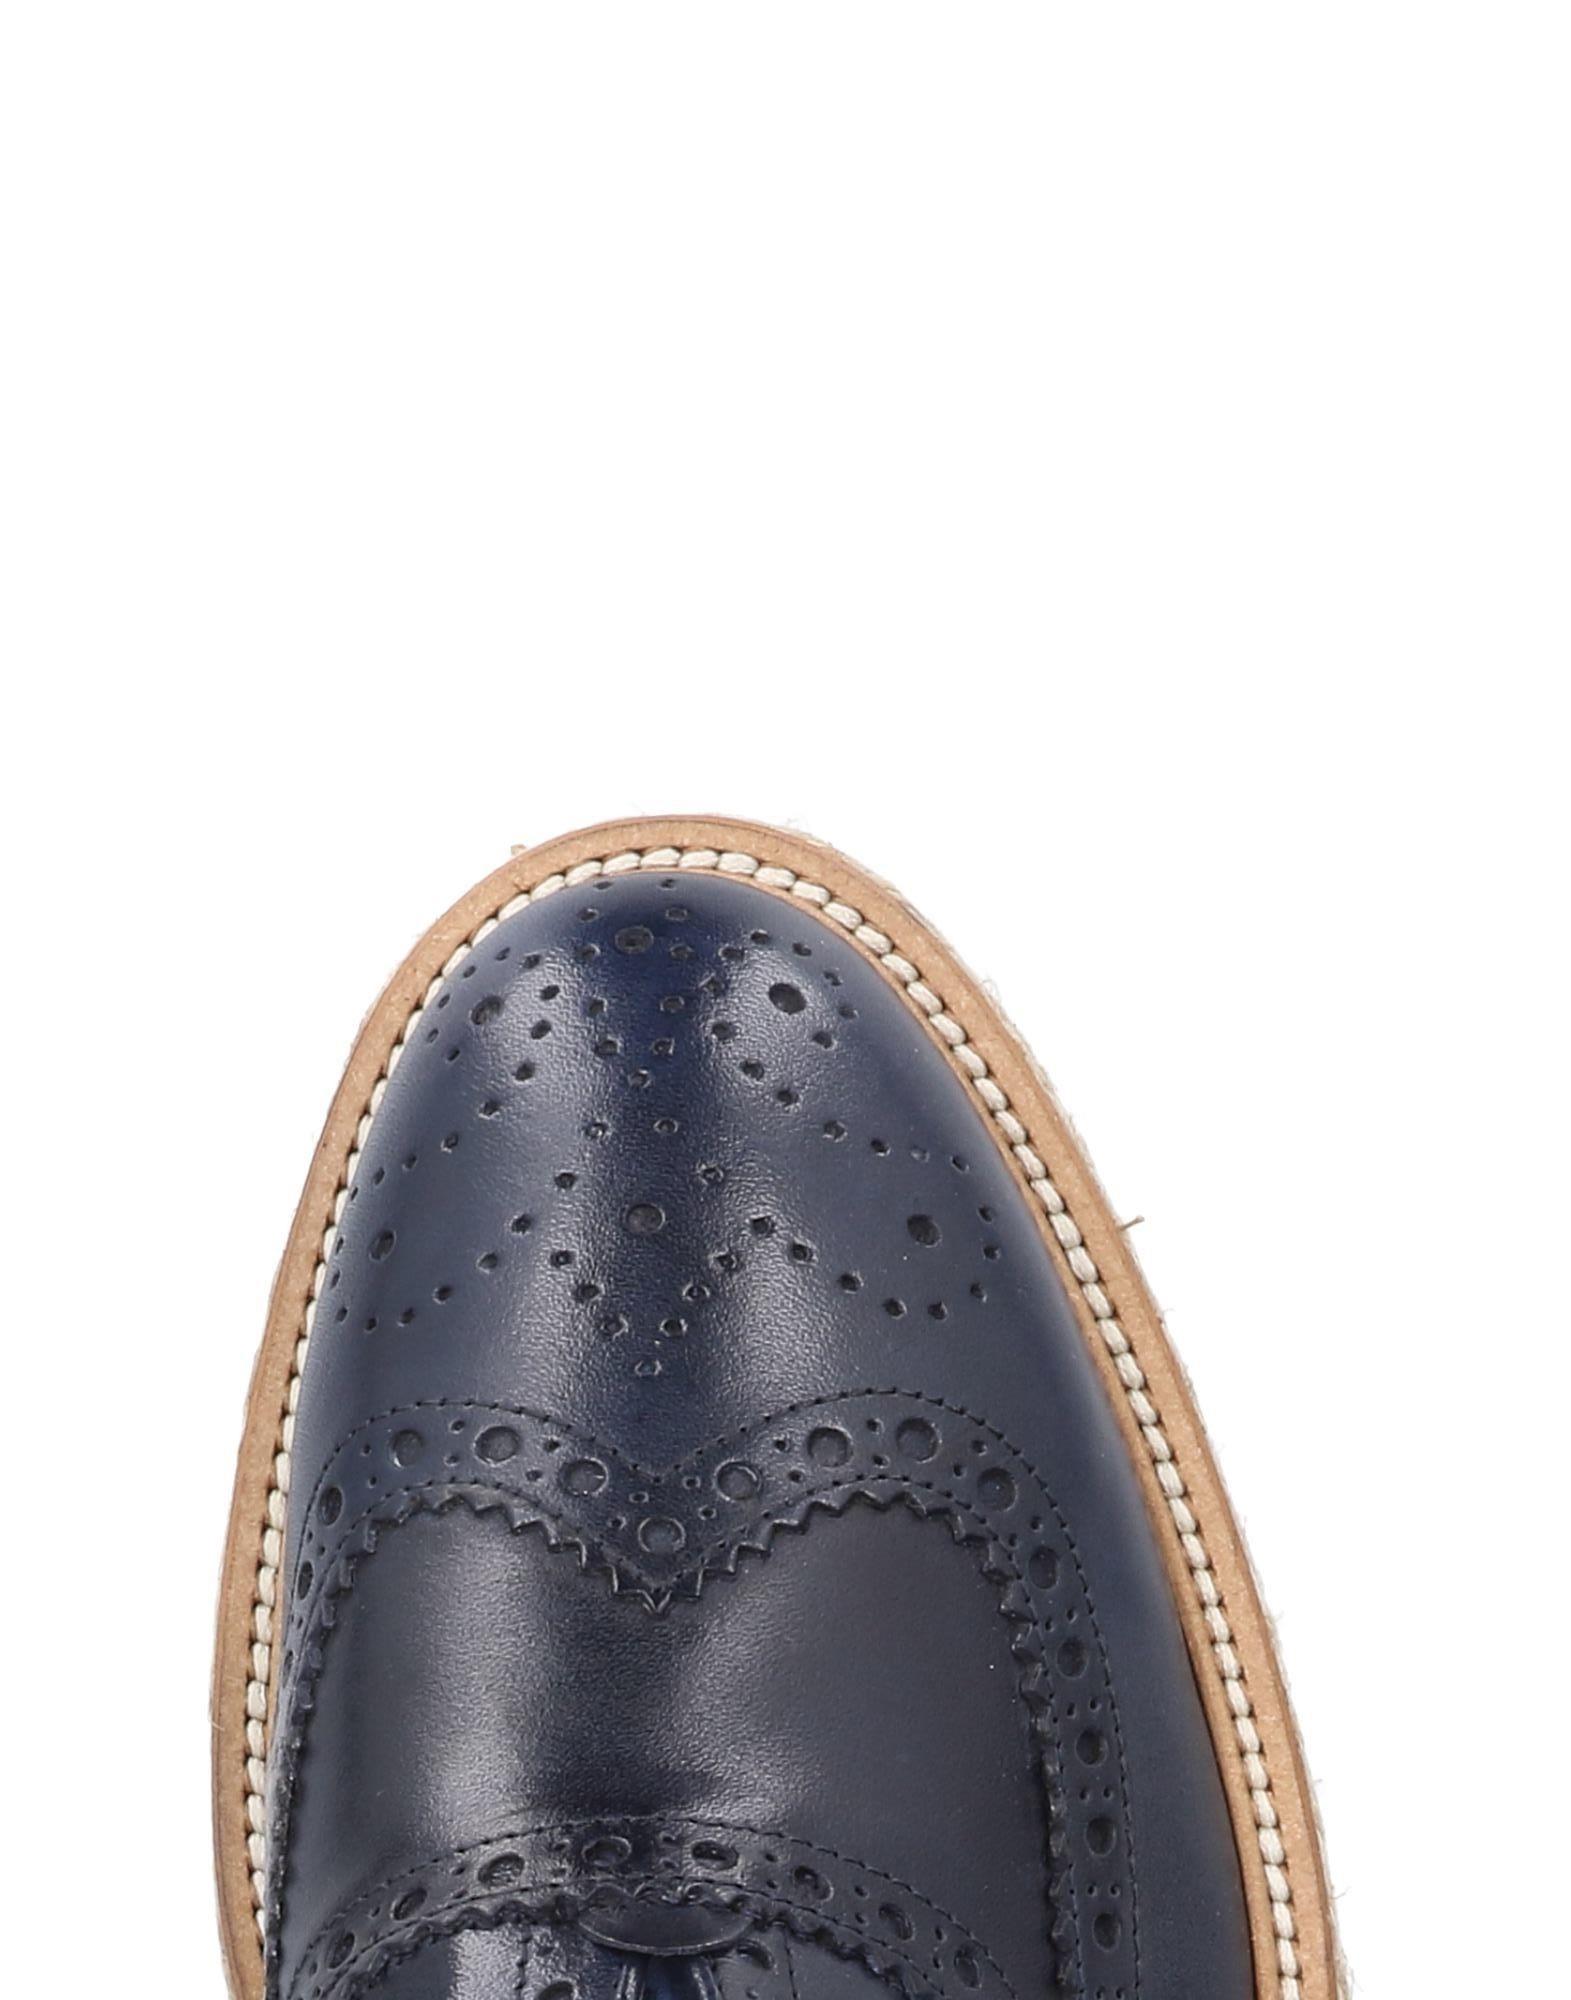 Rabatt echte Schuhe Domenico Tagliente 11393559EX Mokassins Herren  11393559EX Tagliente 4260e6